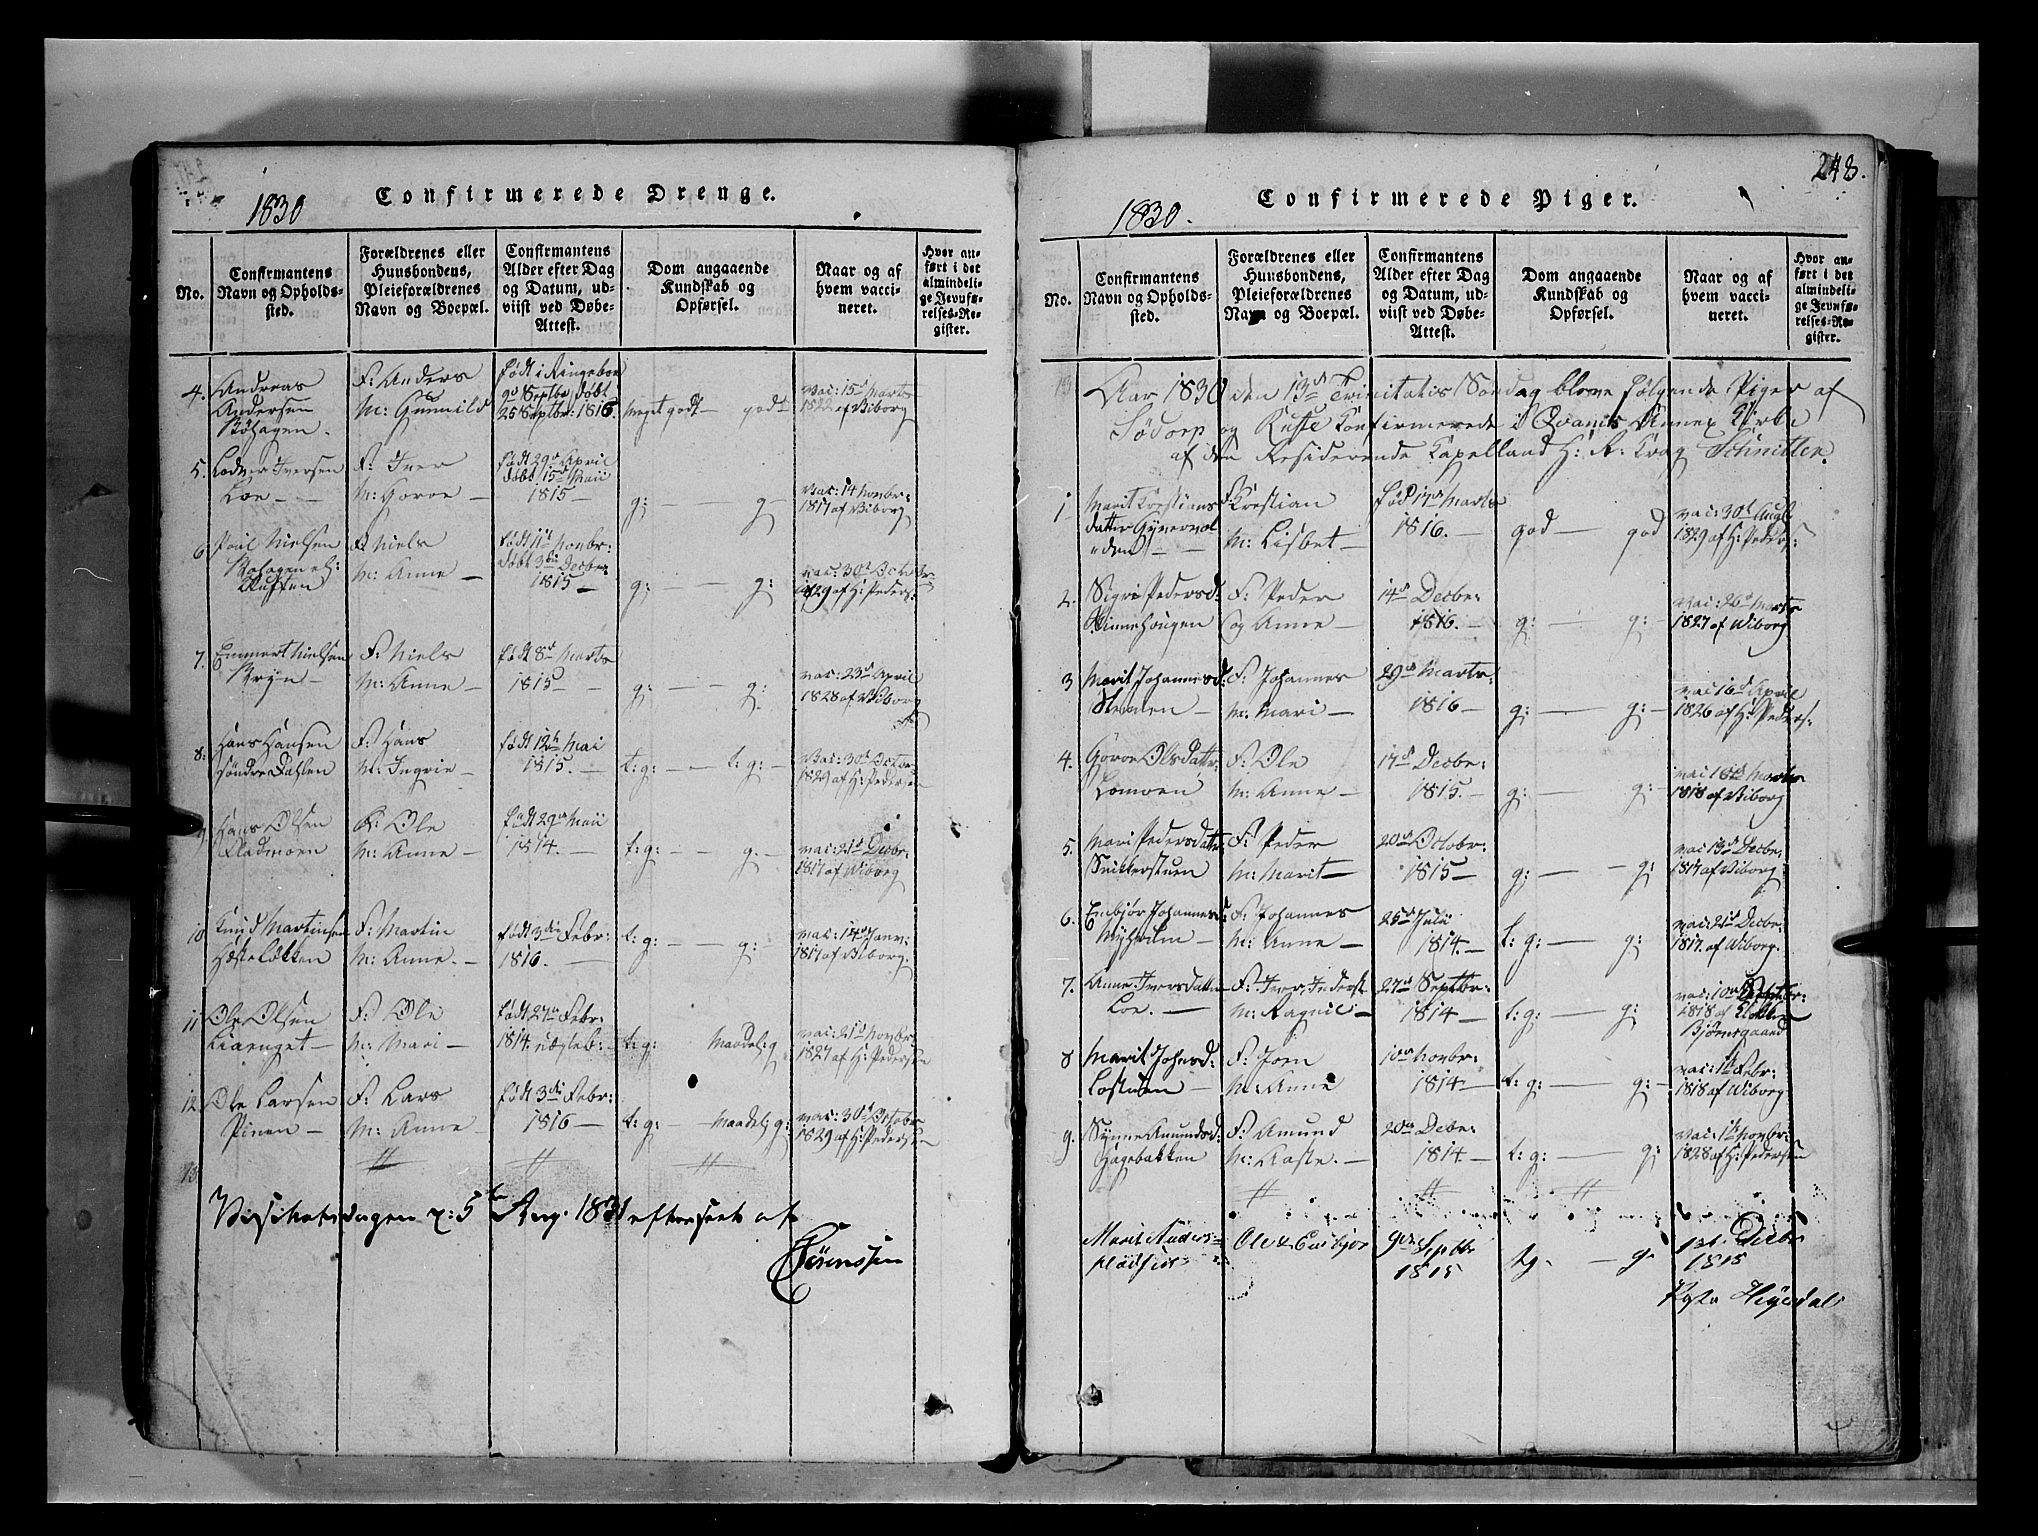 SAH, Fron prestekontor, H/Ha/Hab/L0004: Klokkerbok nr. 4, 1816-1850, s. 248